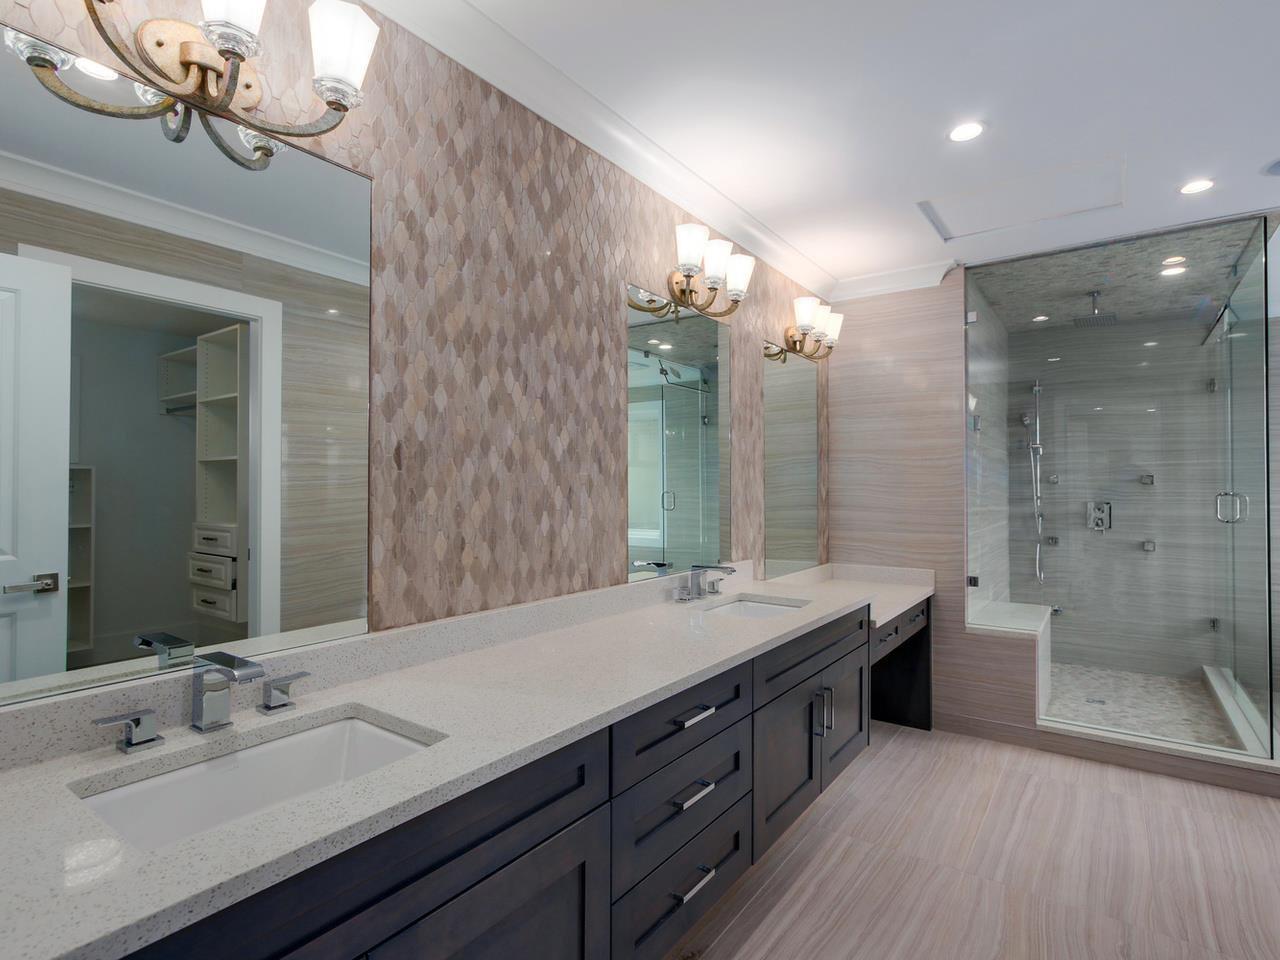 Photo 14: Photos: 1560 MAPLE Street: White Rock House for sale (South Surrey White Rock)  : MLS®# R2138926